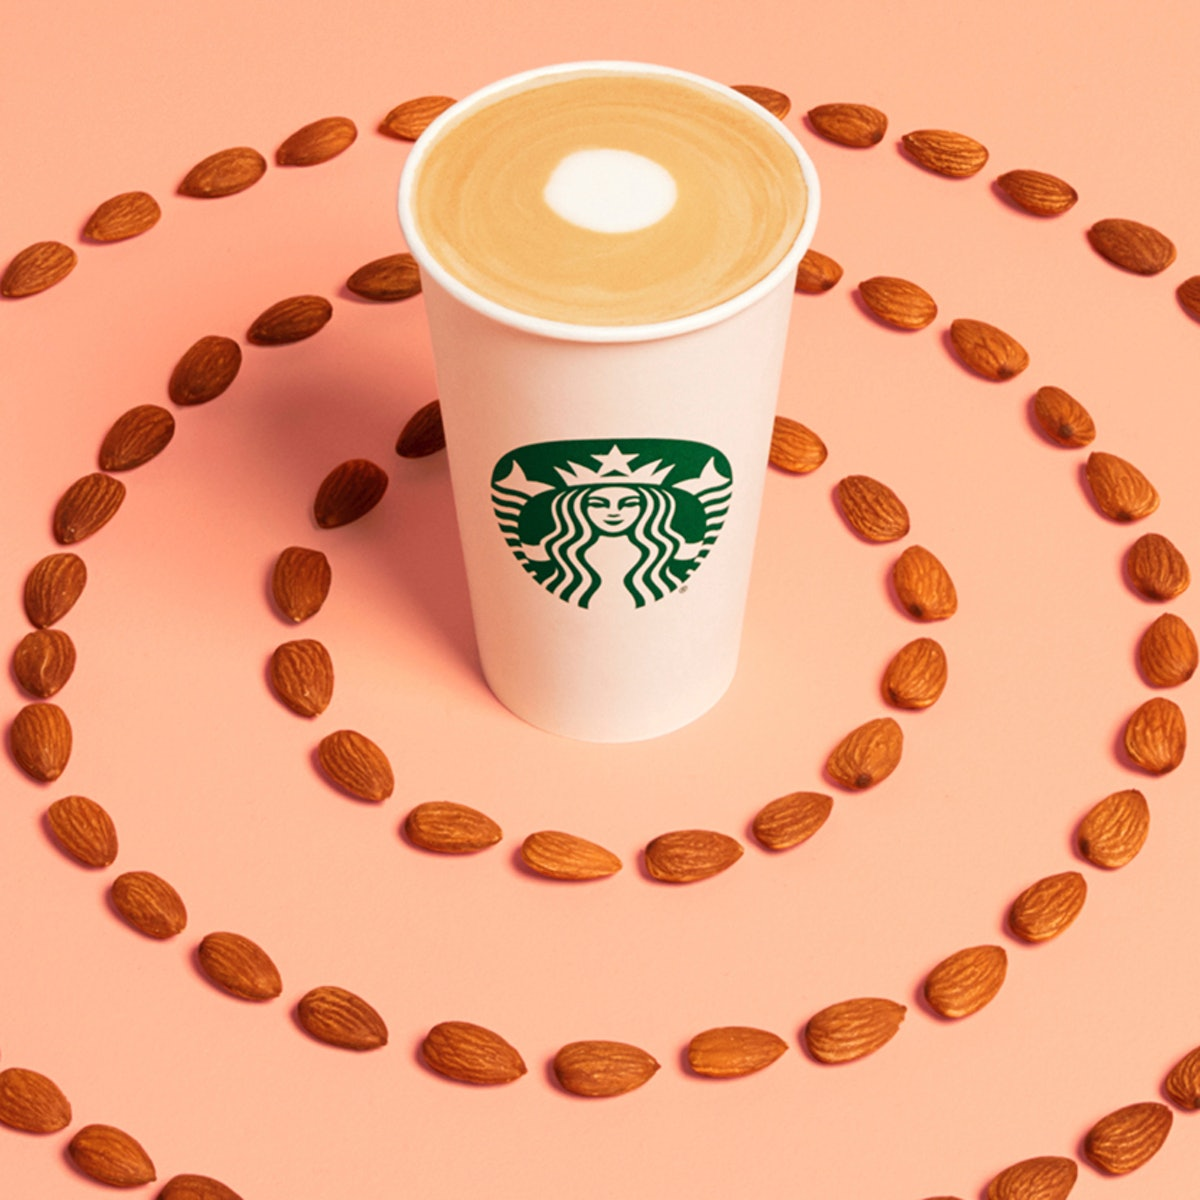 Starbucks' Almondmilk Honey Flat White boasts 225 mg of caffeine in a grande size.